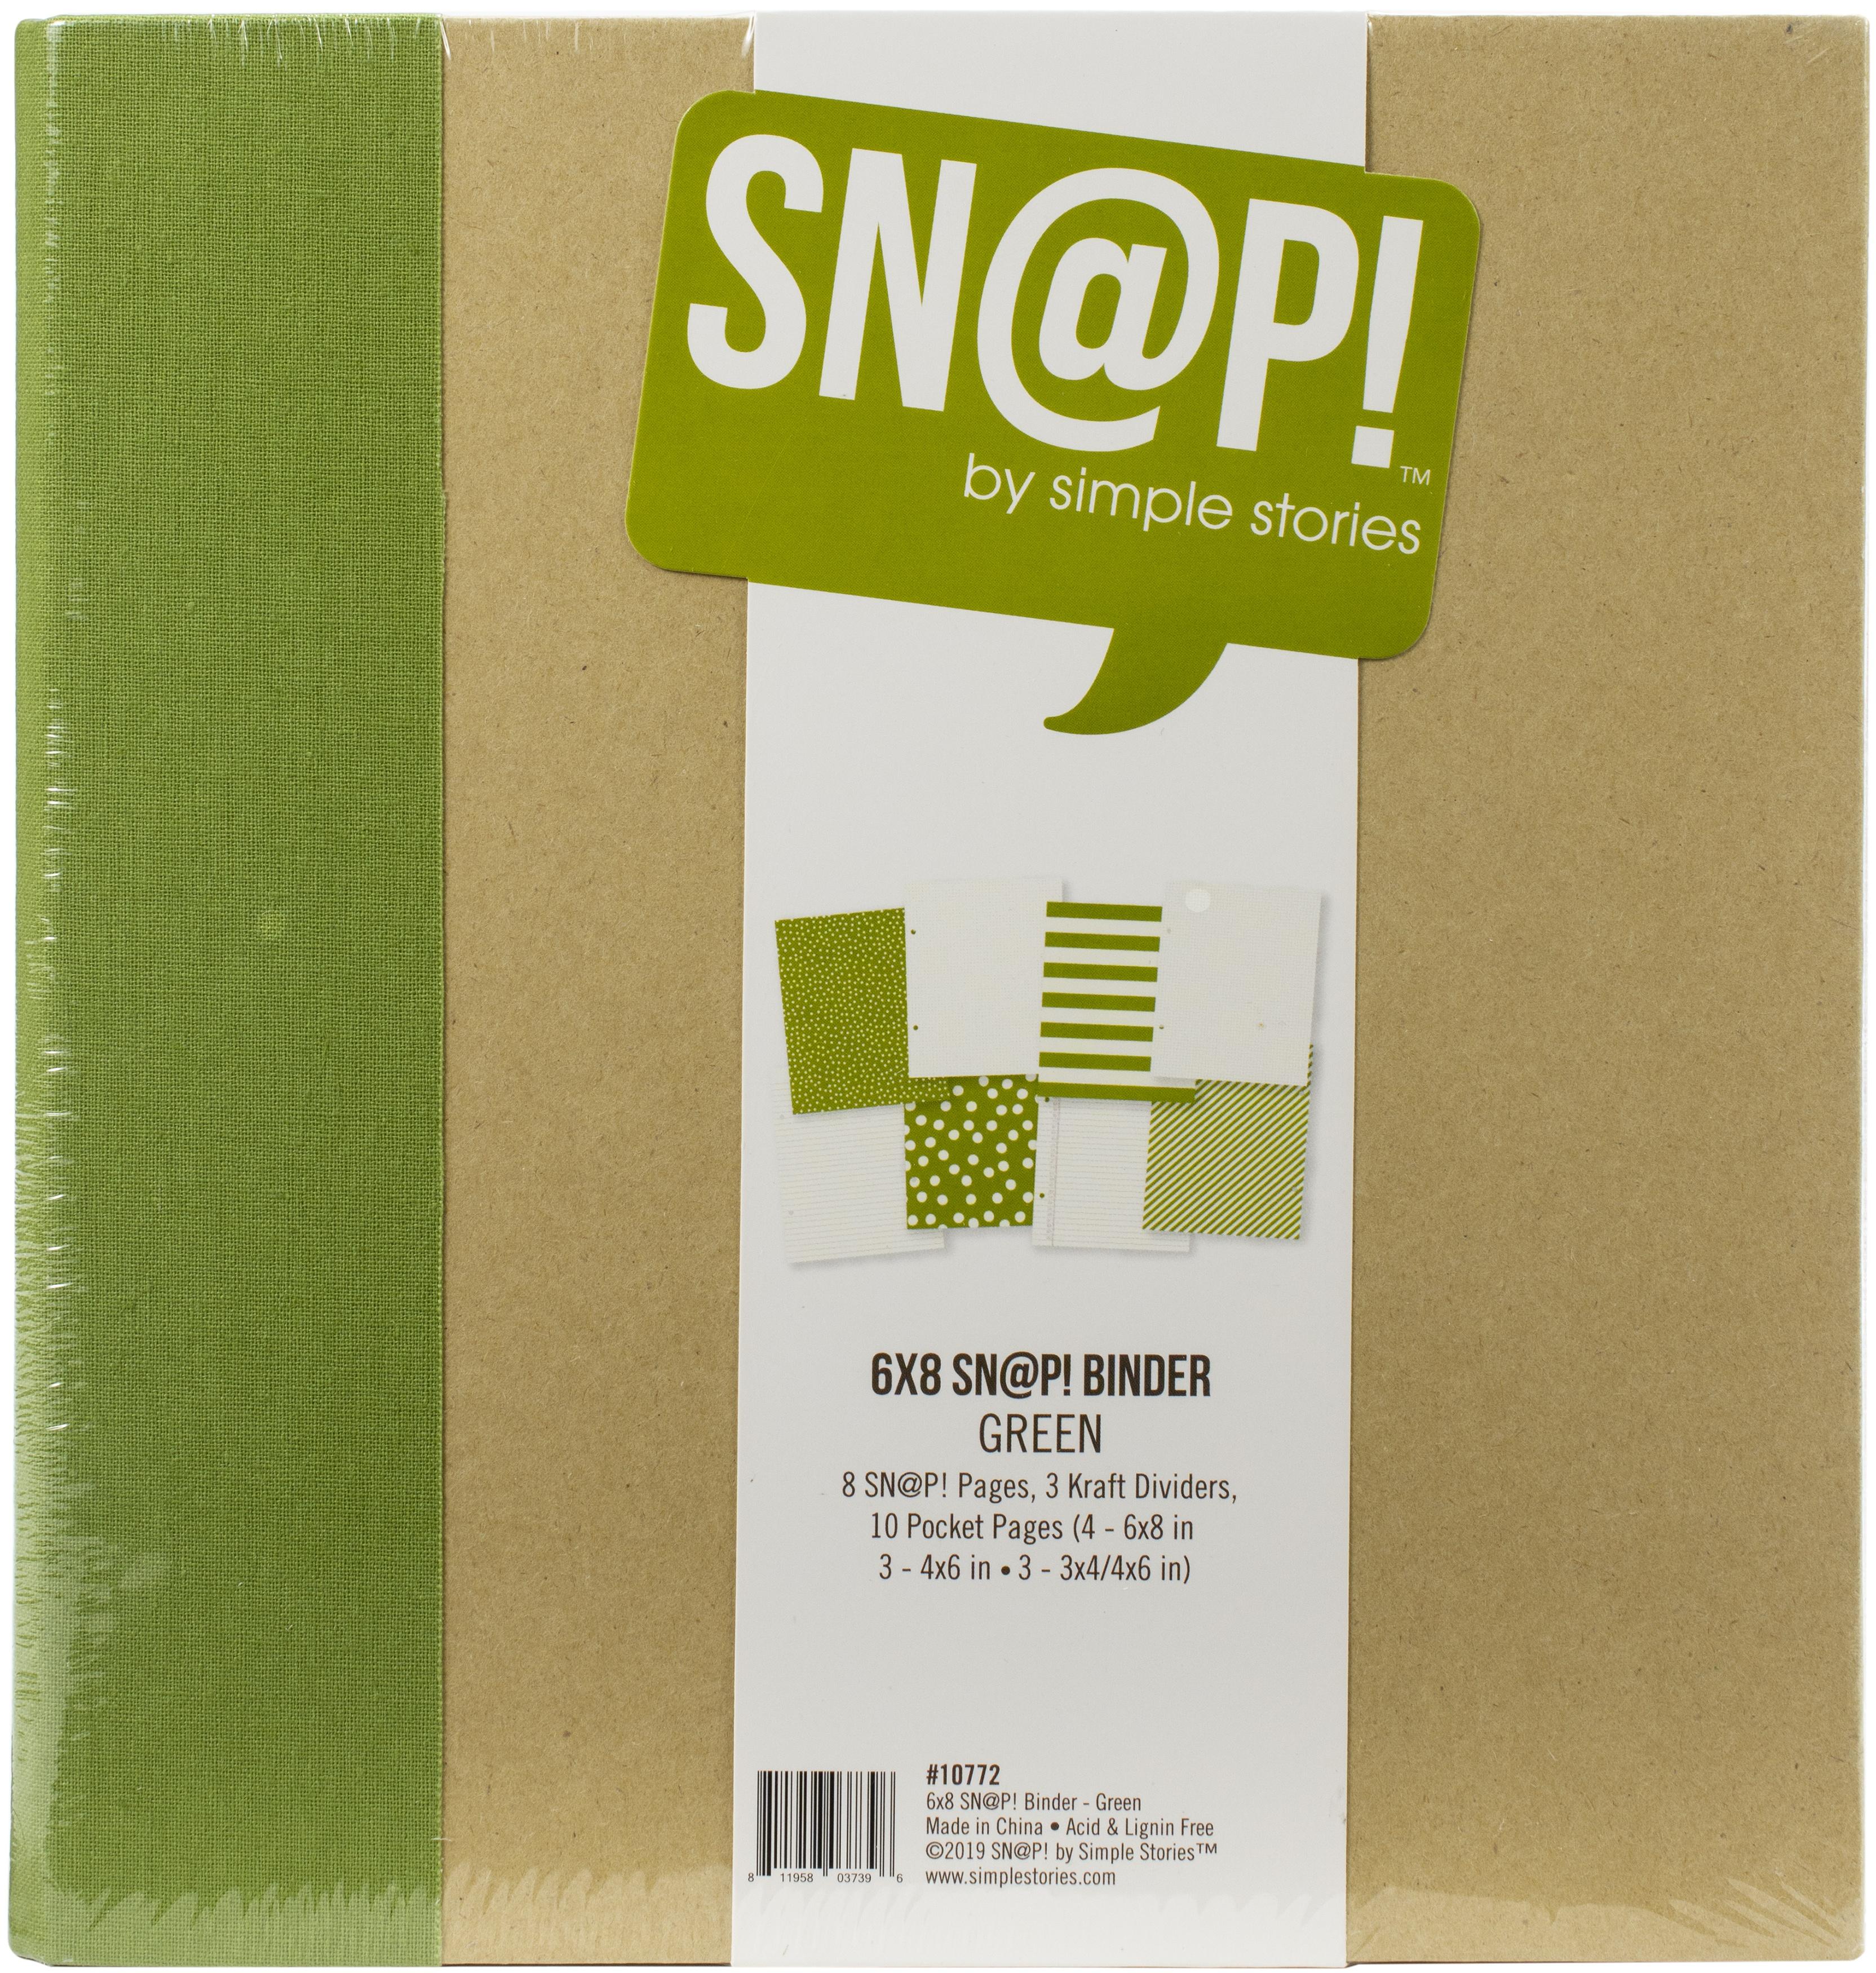 Simple Stories Sn@p! Binder 6X8-Green